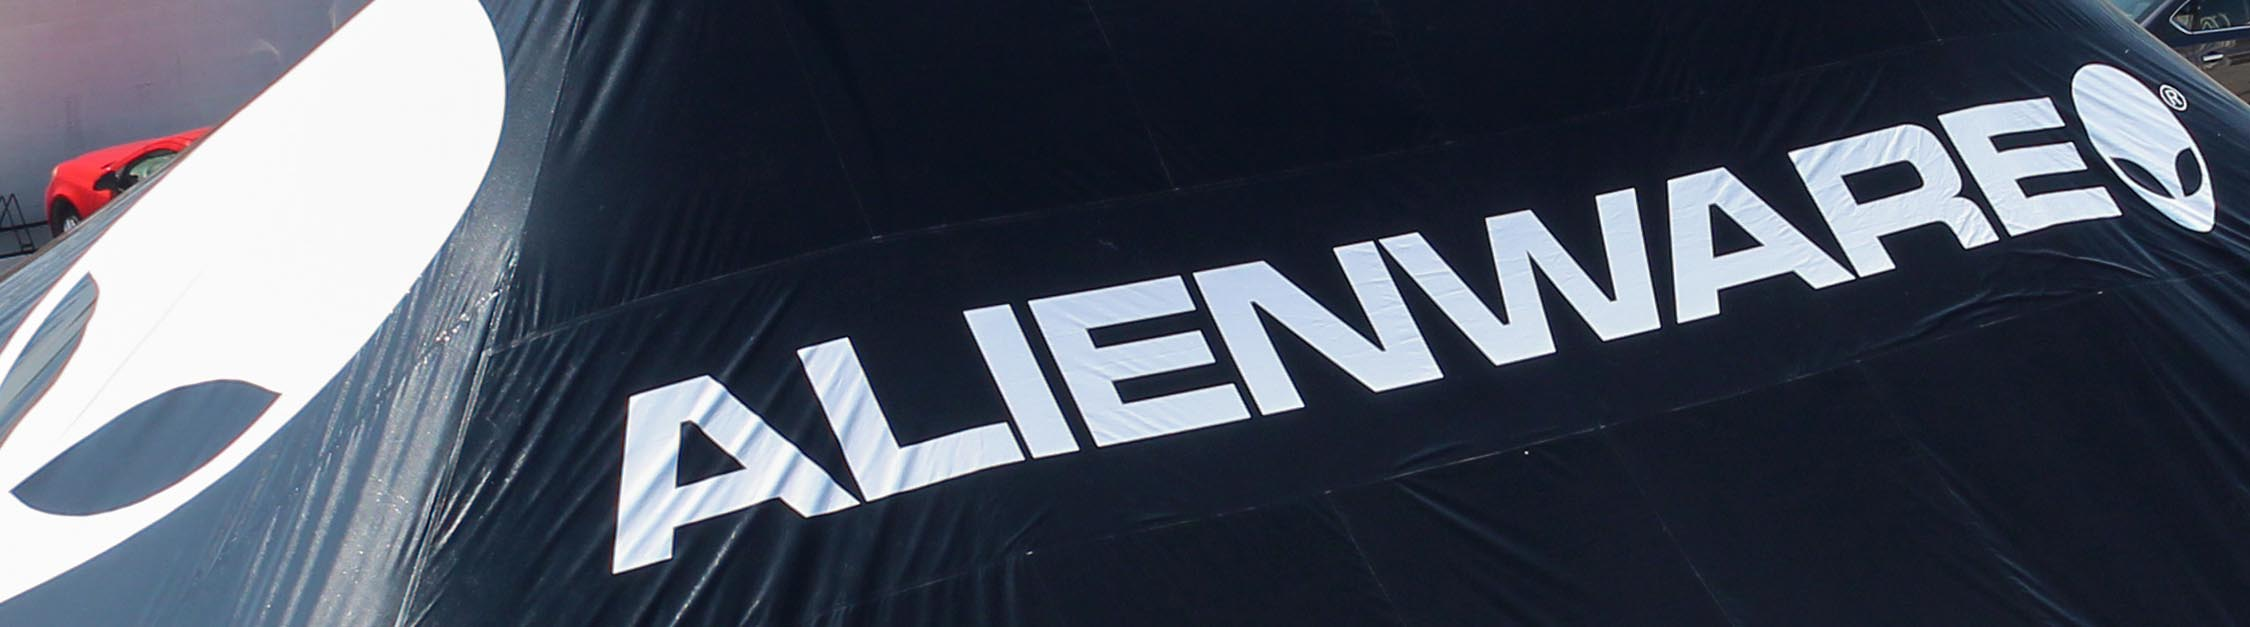 Alienware-high-peak-tent.jpg